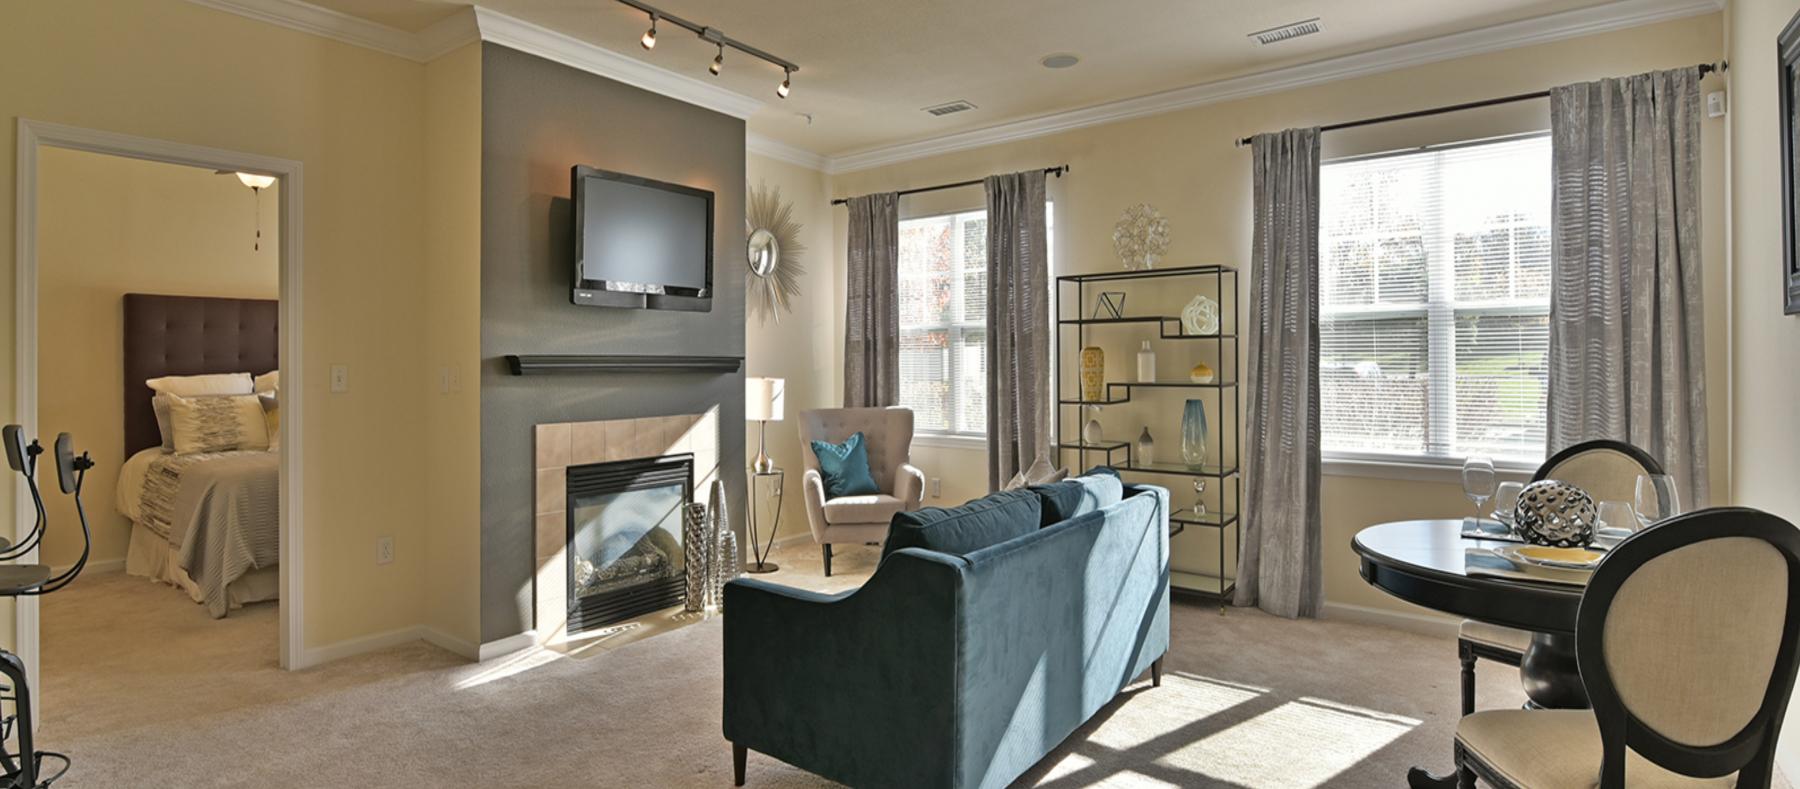 10 - Aparment Living Room copy 2